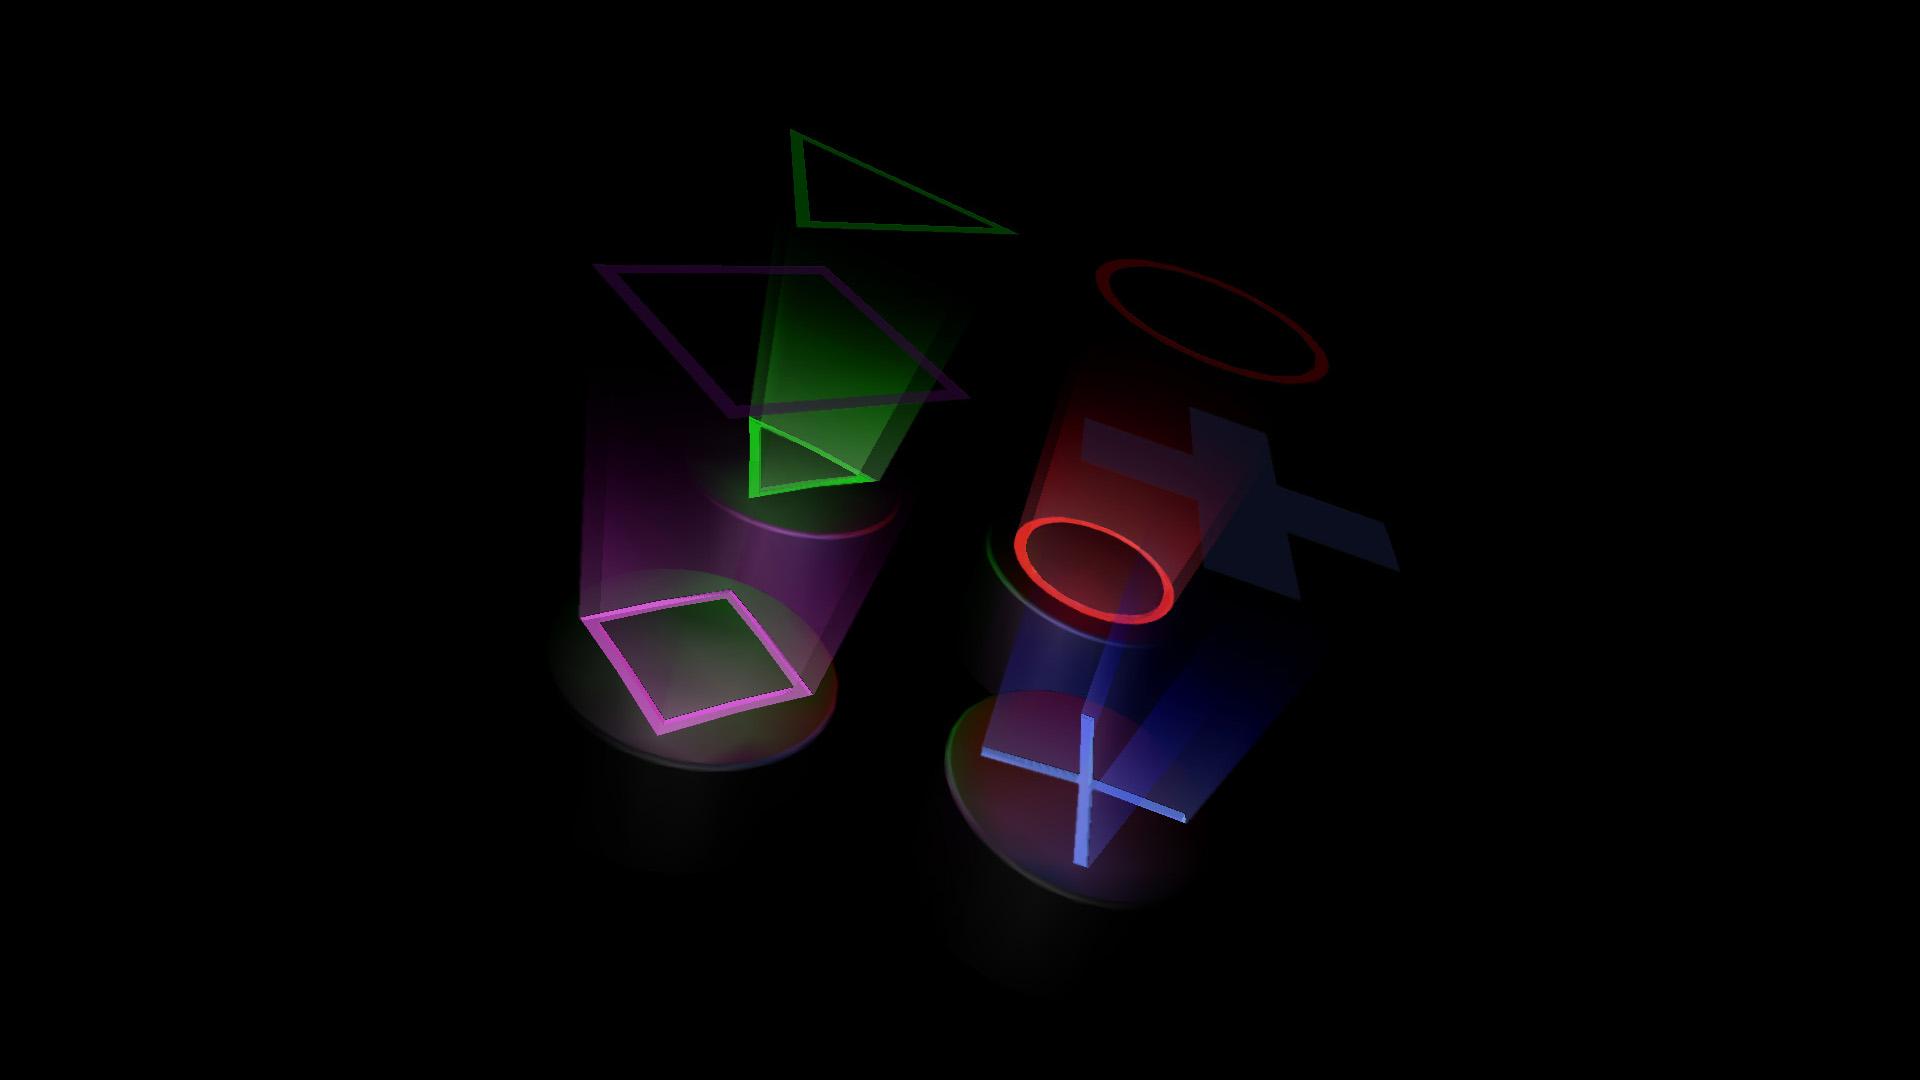 HD Playstation Wallpapers - WallpaperSafari